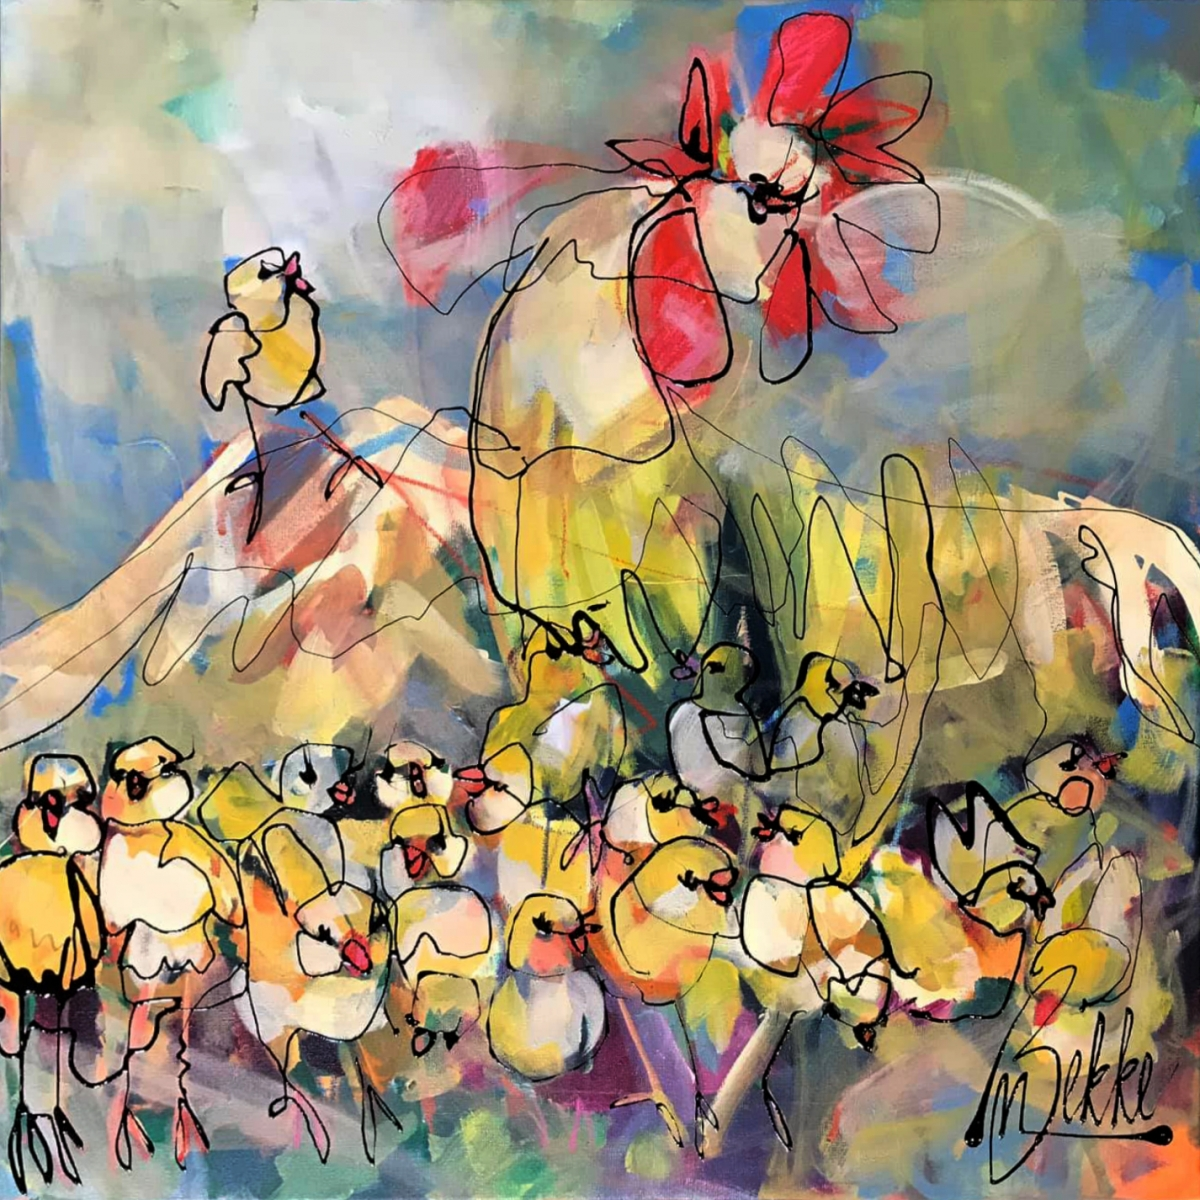 Kunst: Patroness van kunstenaar Marieke Bekke